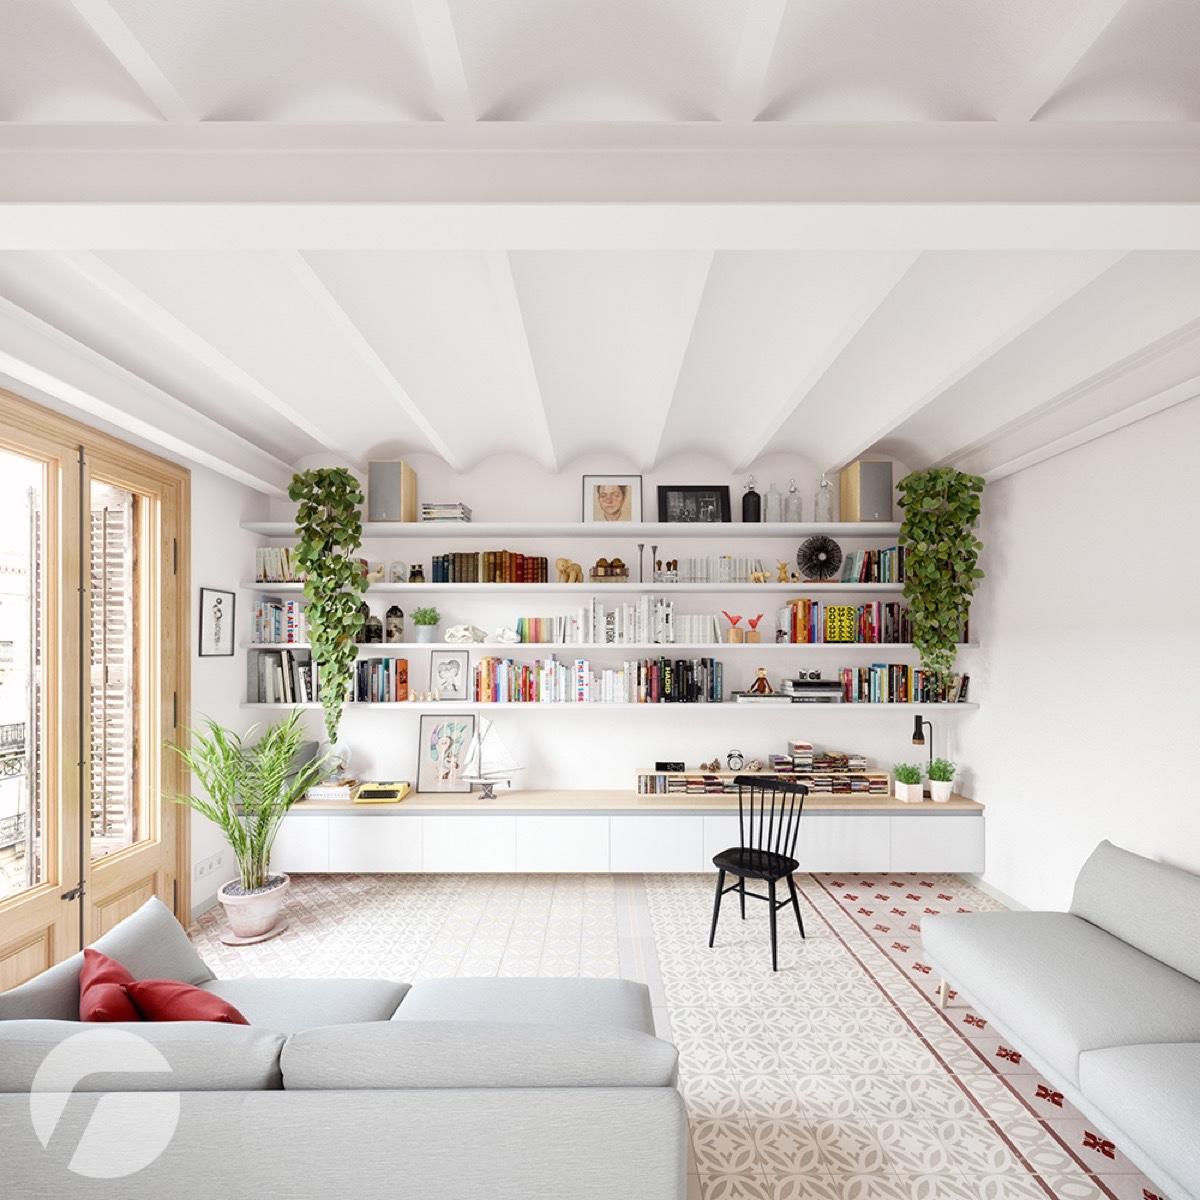 Townhouse Renovation Ideas